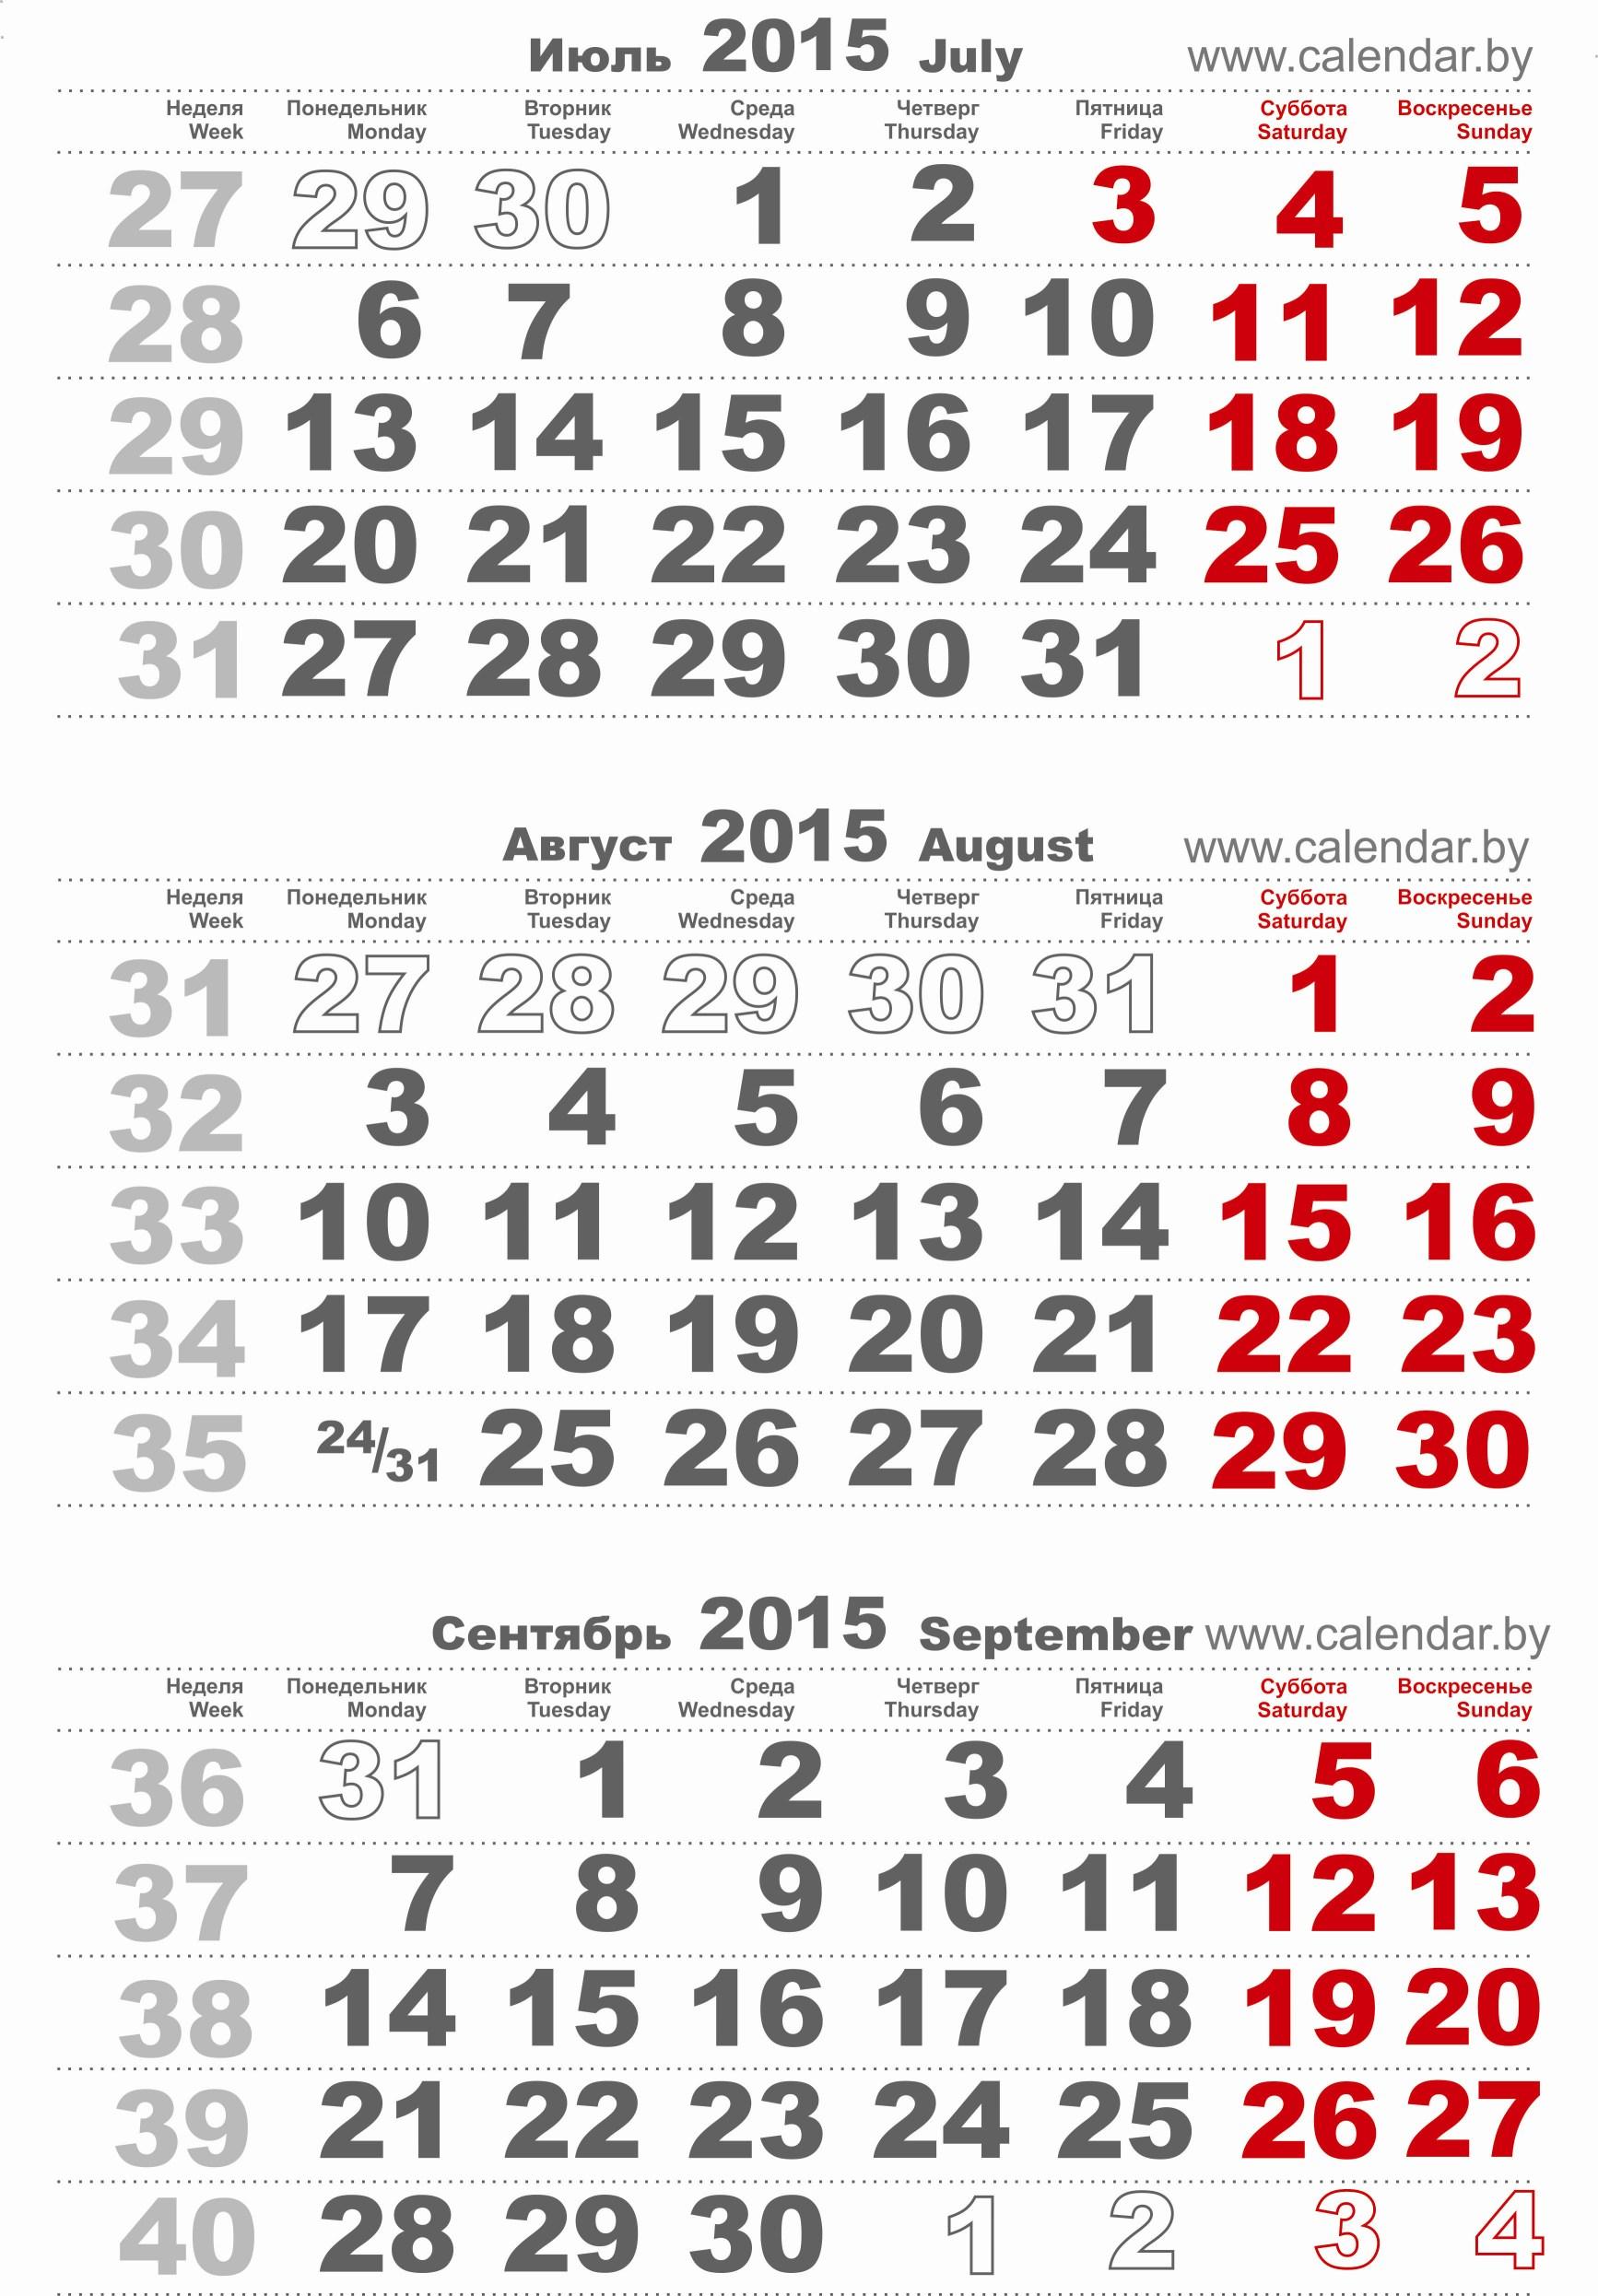 Календарь 2017 для отпусков